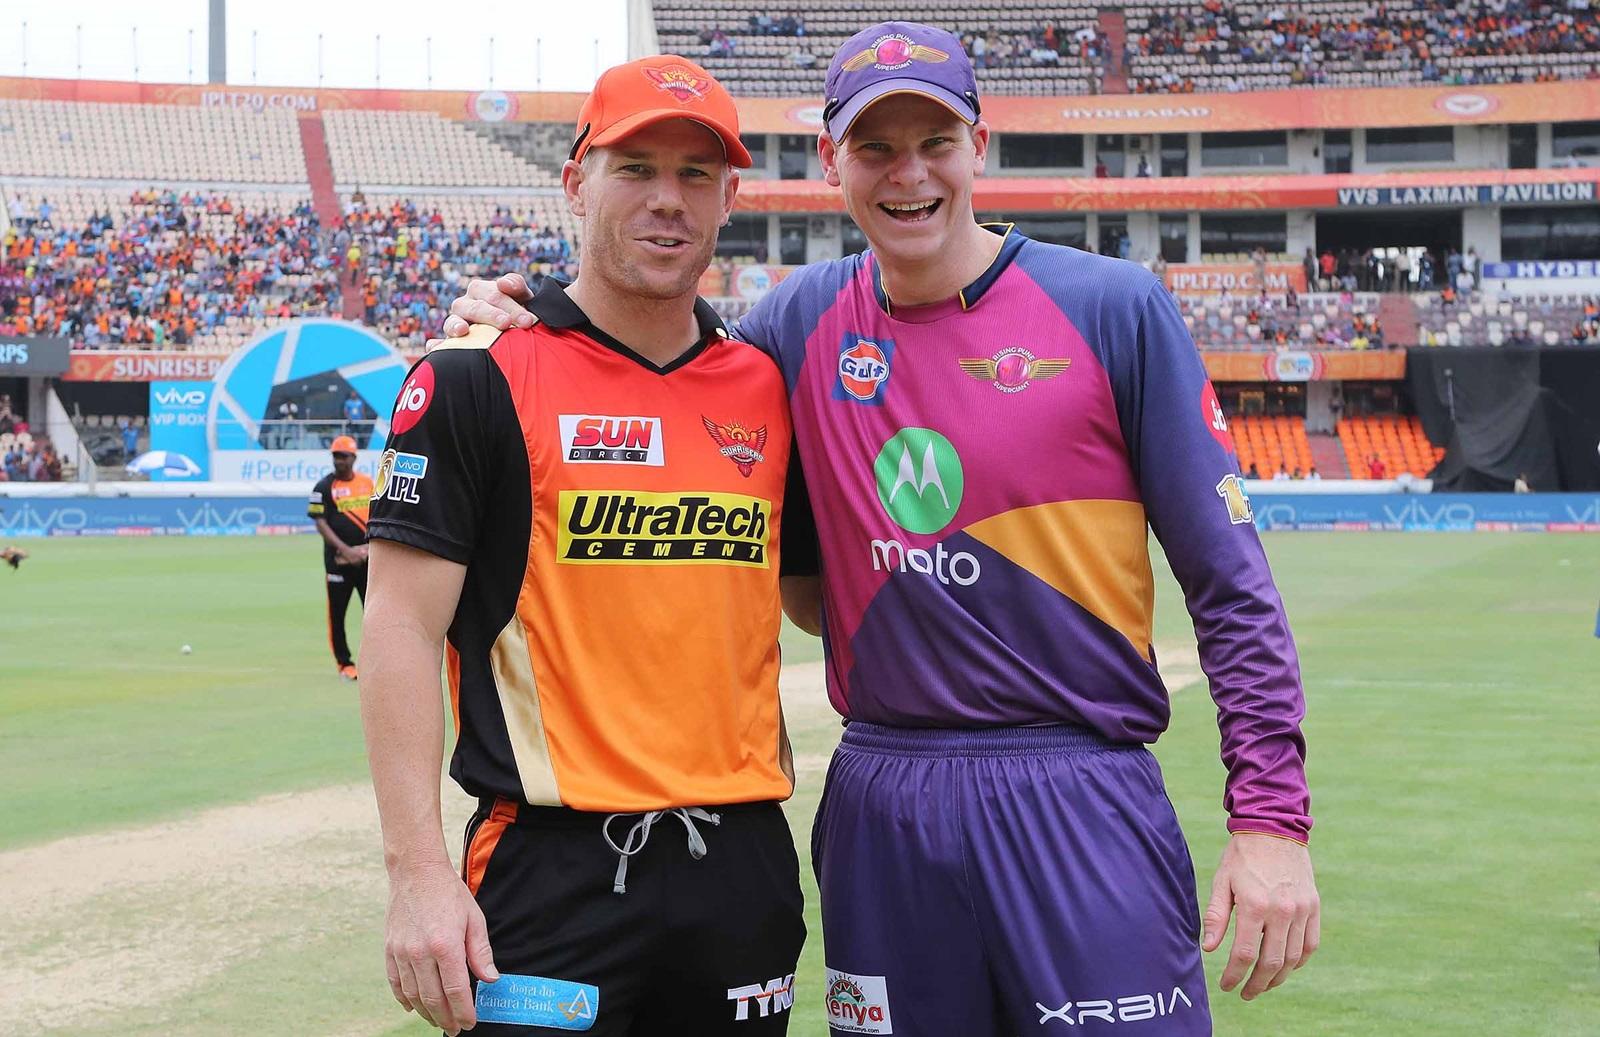 Australian players face choice with IPL set for UAE stint | cricket.com.au